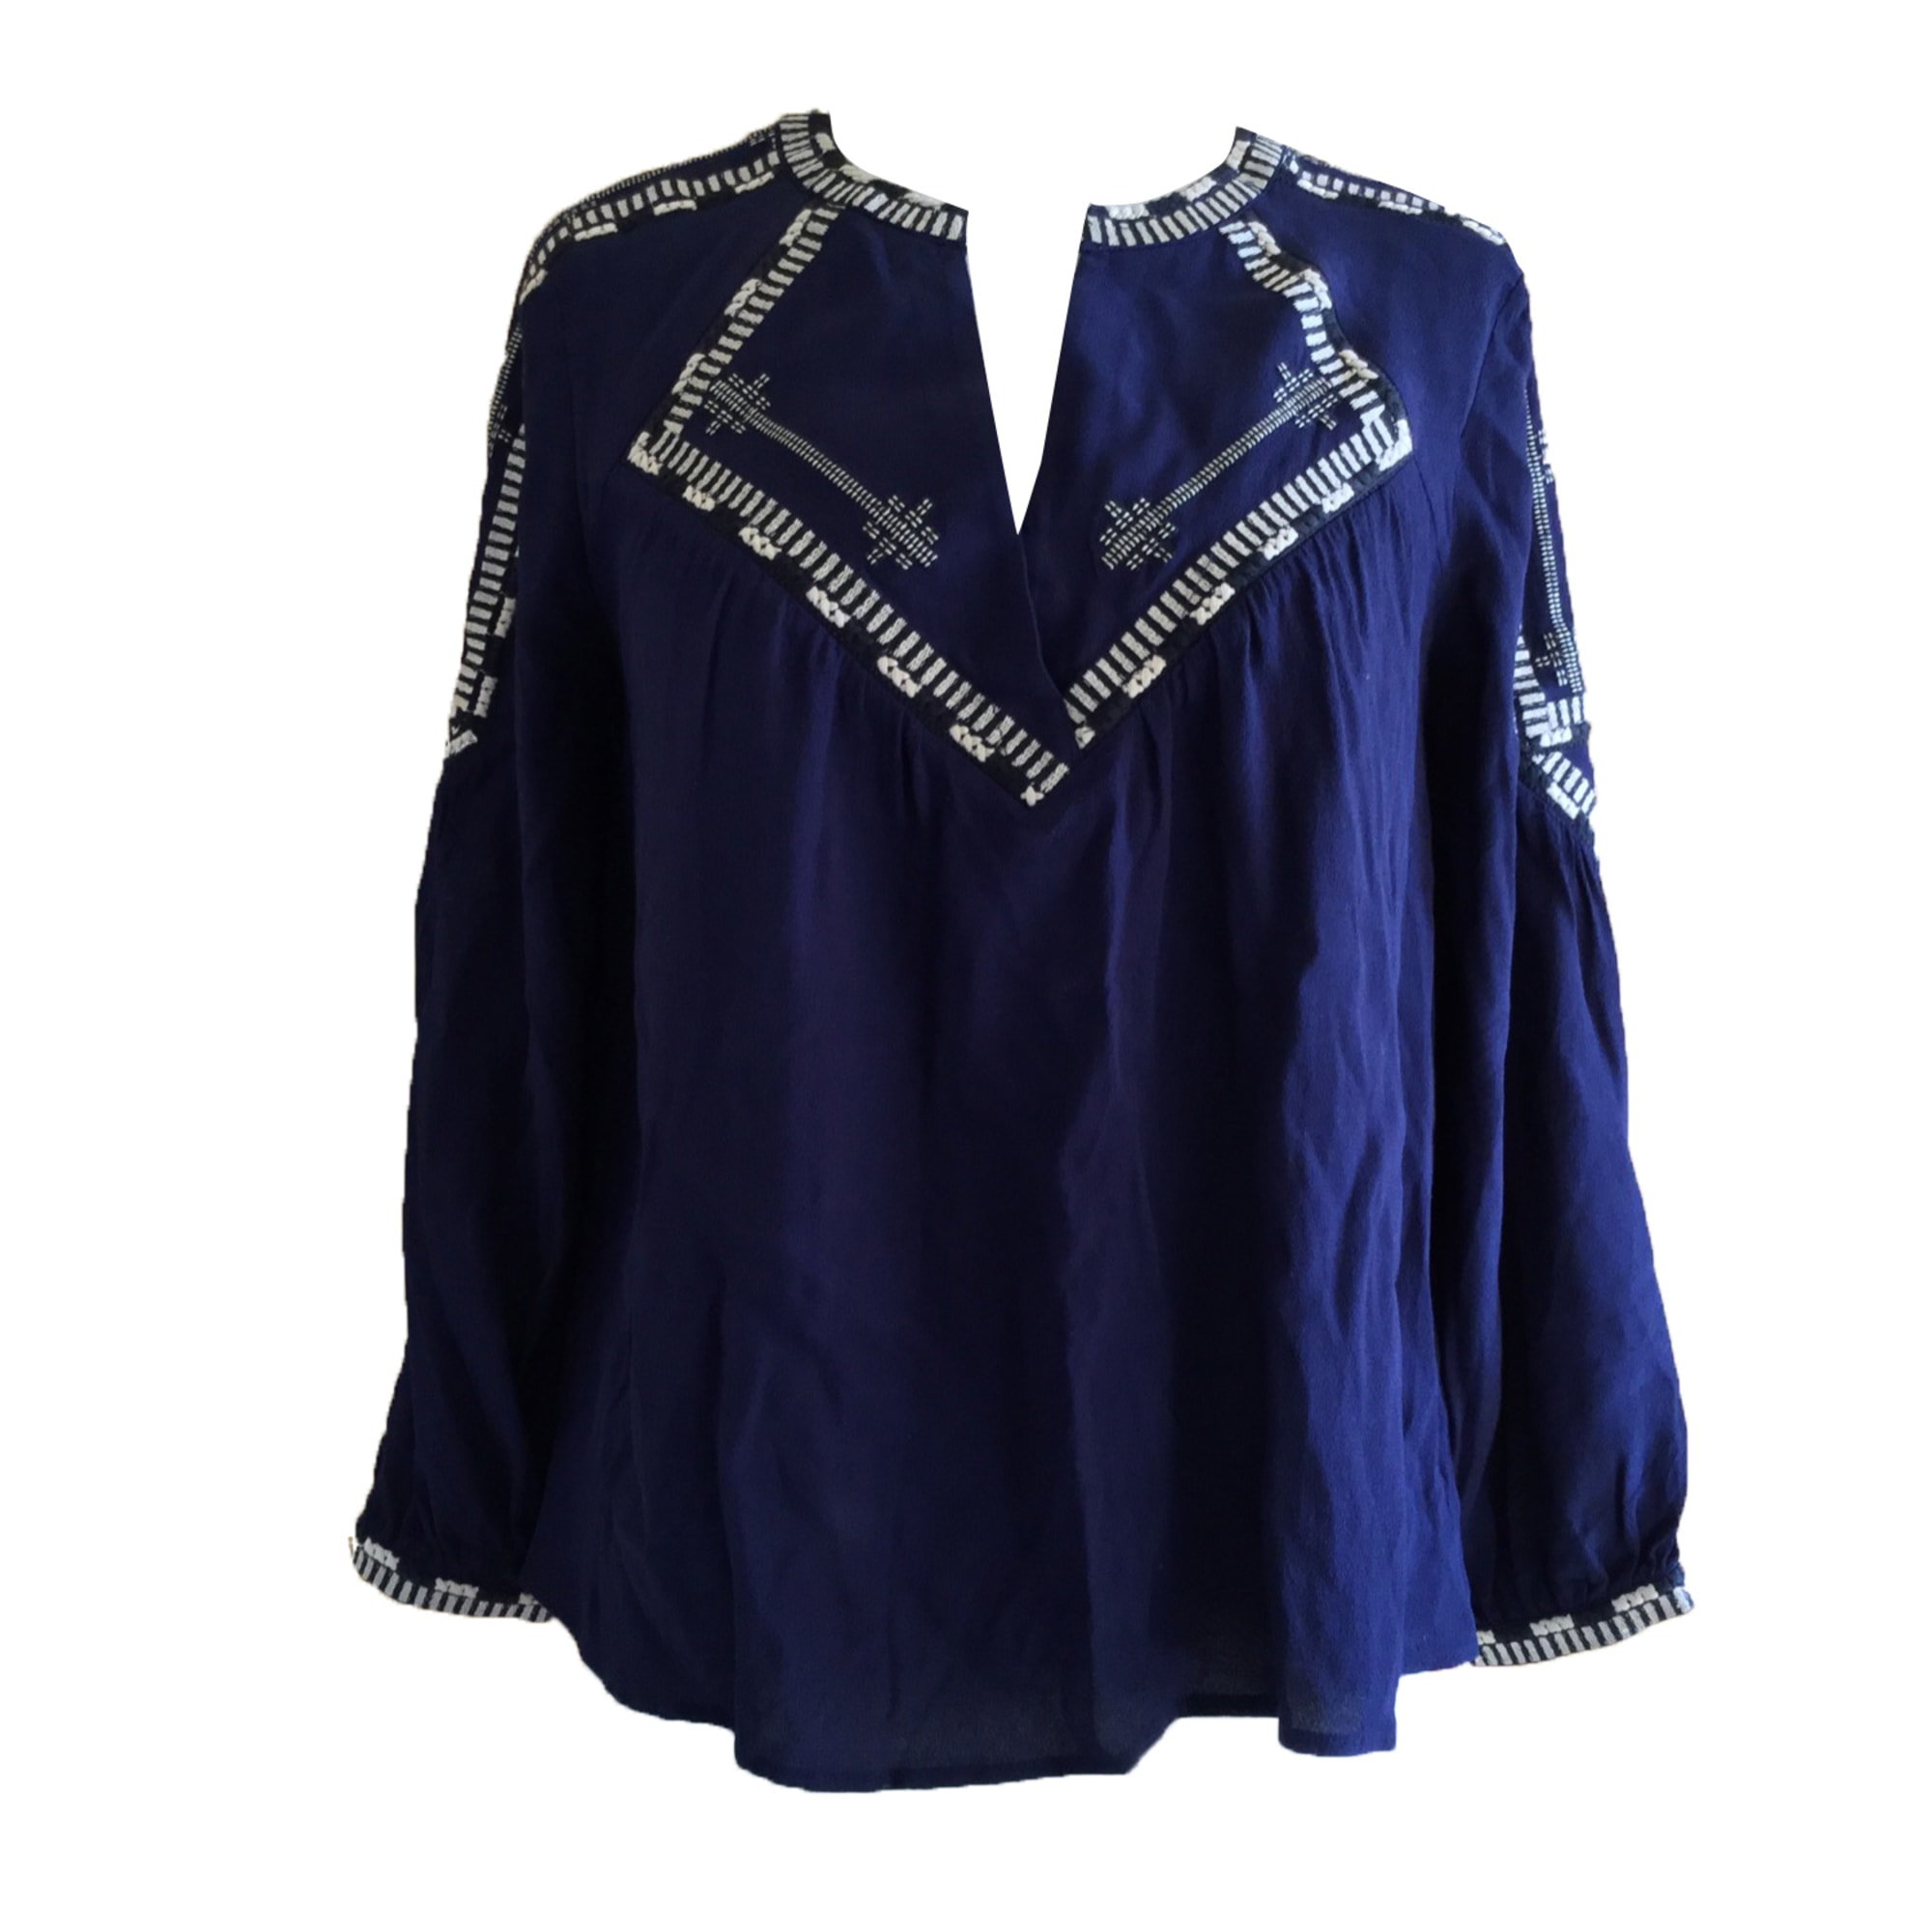 Blouse BA&SH Blue, navy, turquoise